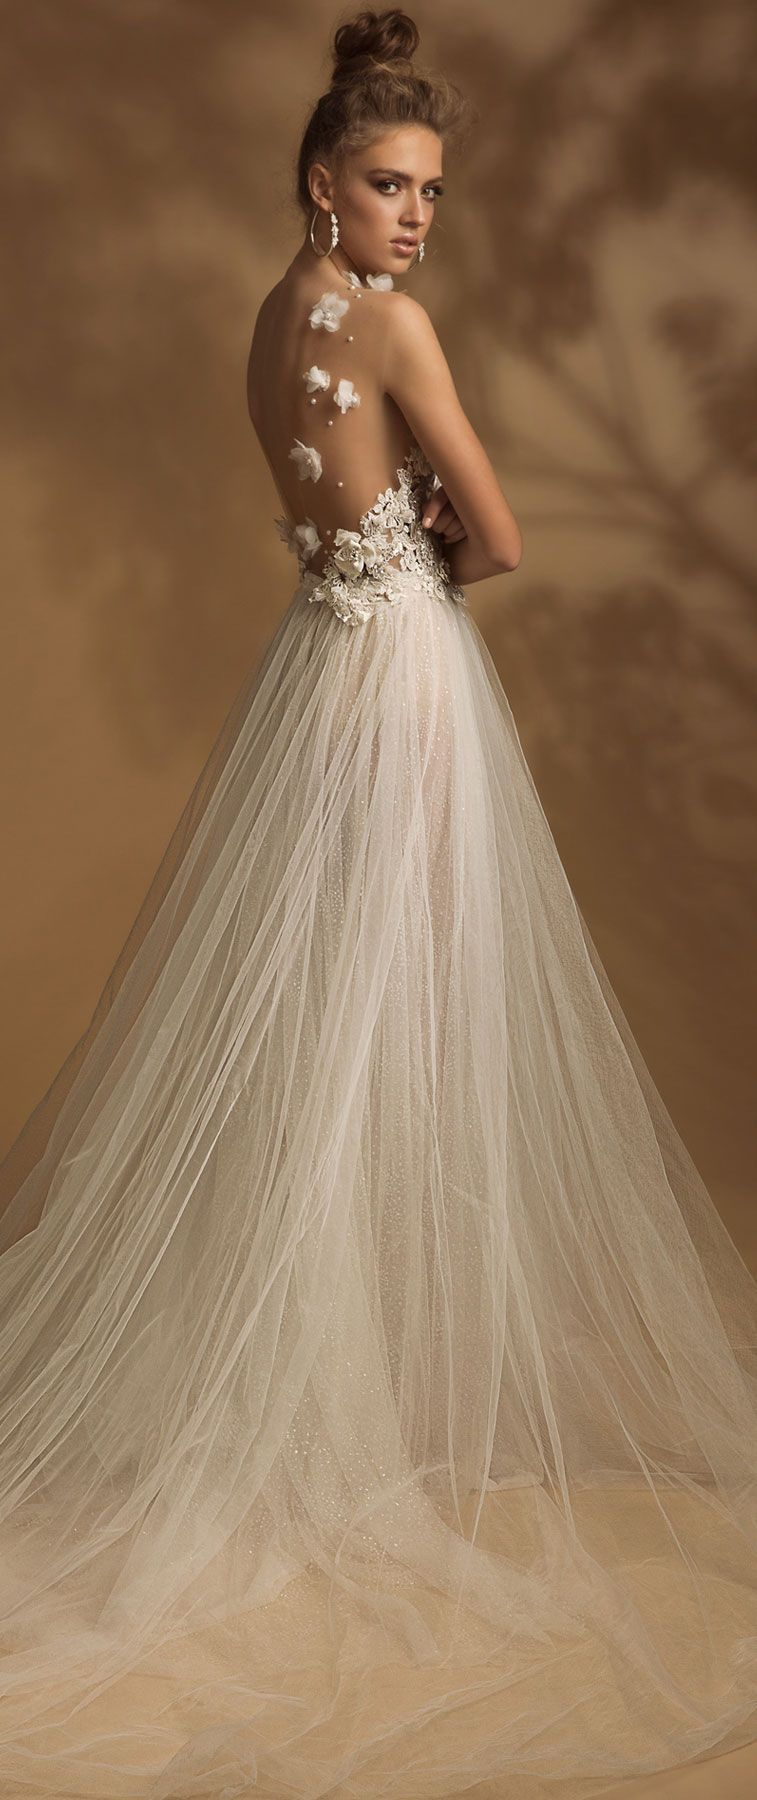 Irena Burshtein 2018 Wedding Dresses   Wedding dress, Inspiration ...